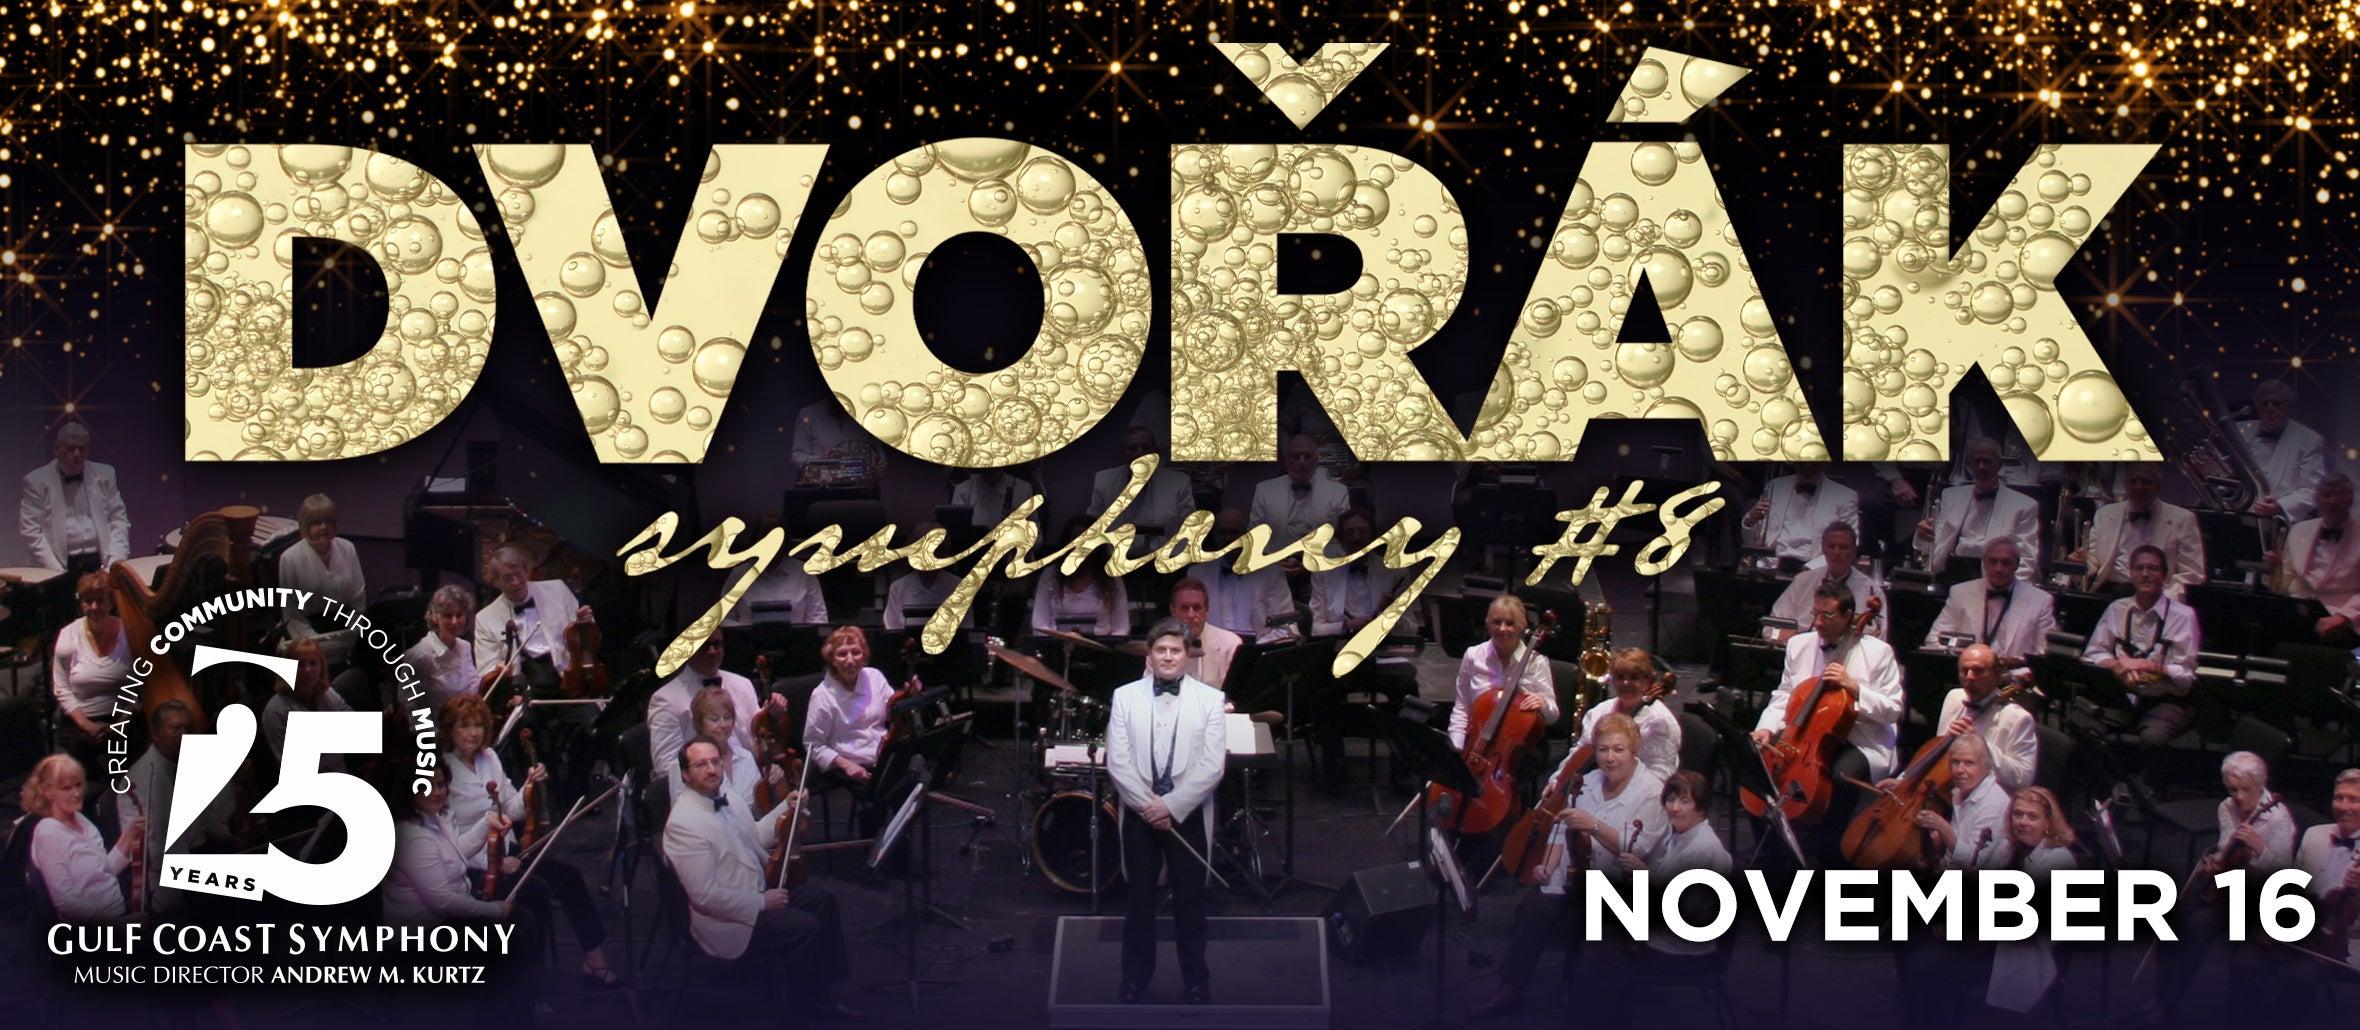 Gulf Coast Symphony: Dvorak Symphony No. 9